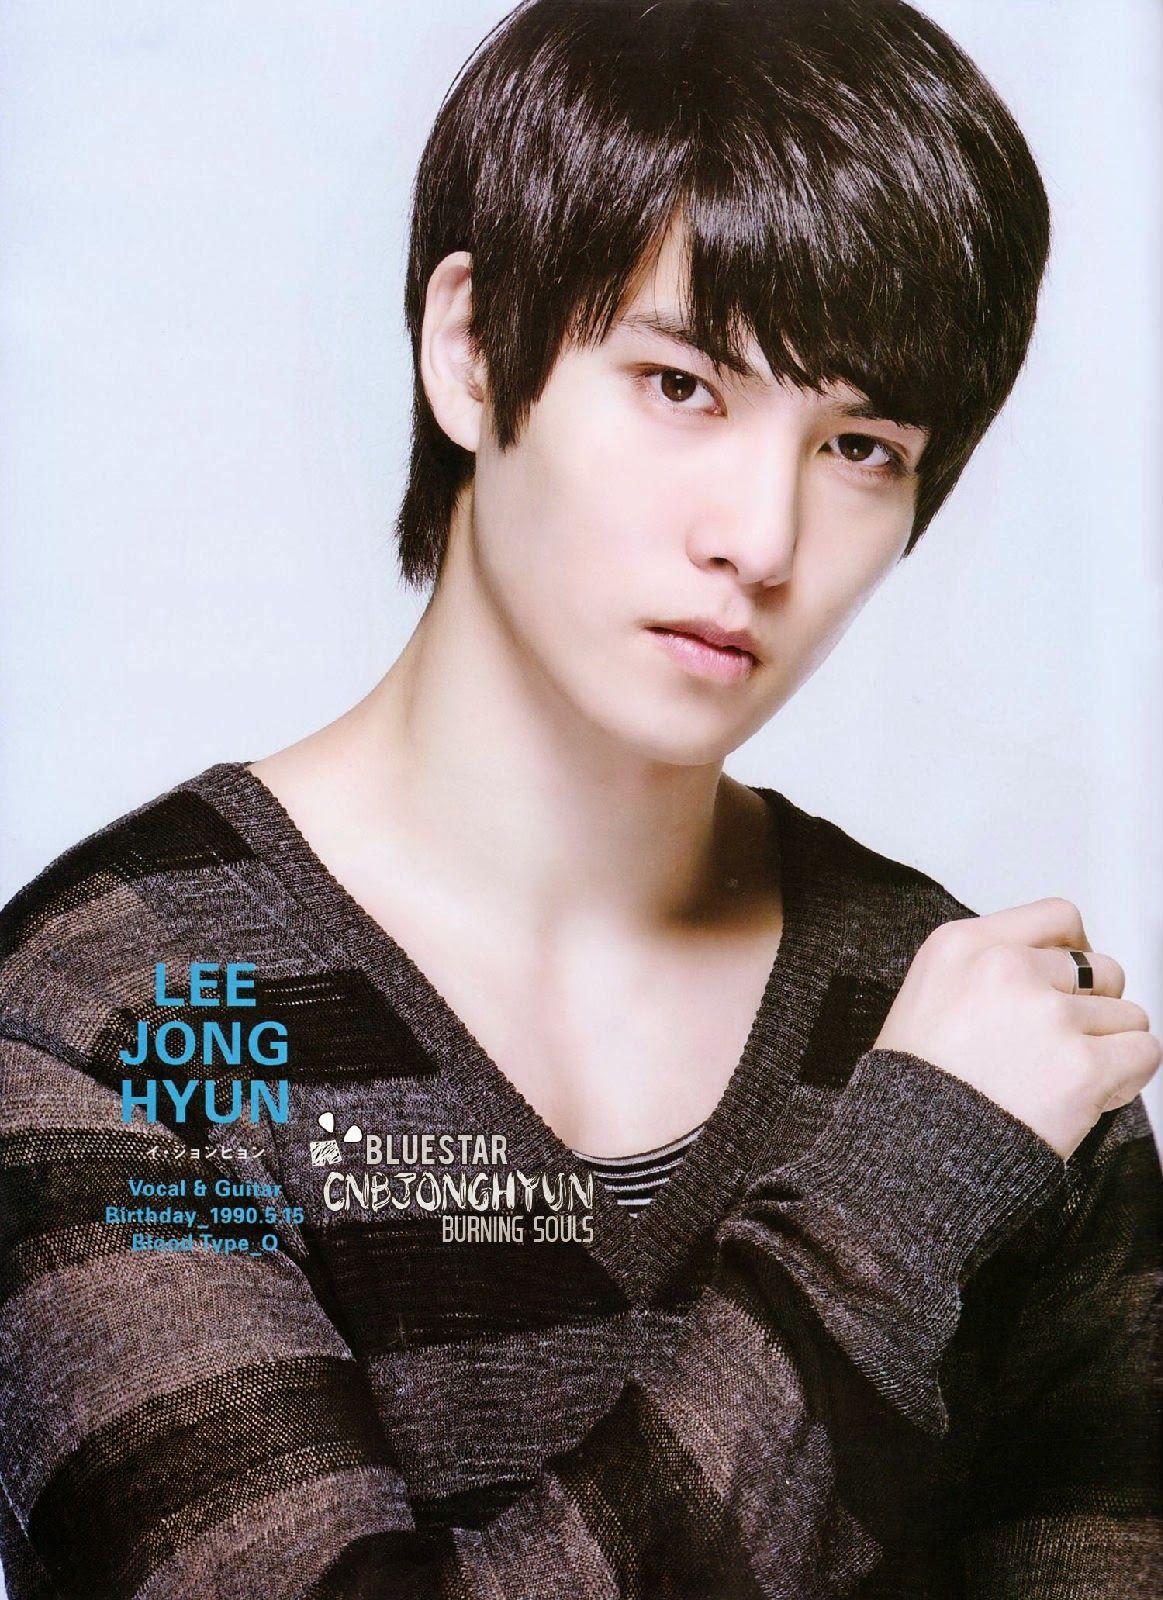 Cnblue Kpop Idols Profiles Lee Jong Hyun Cnblue Jonghyun